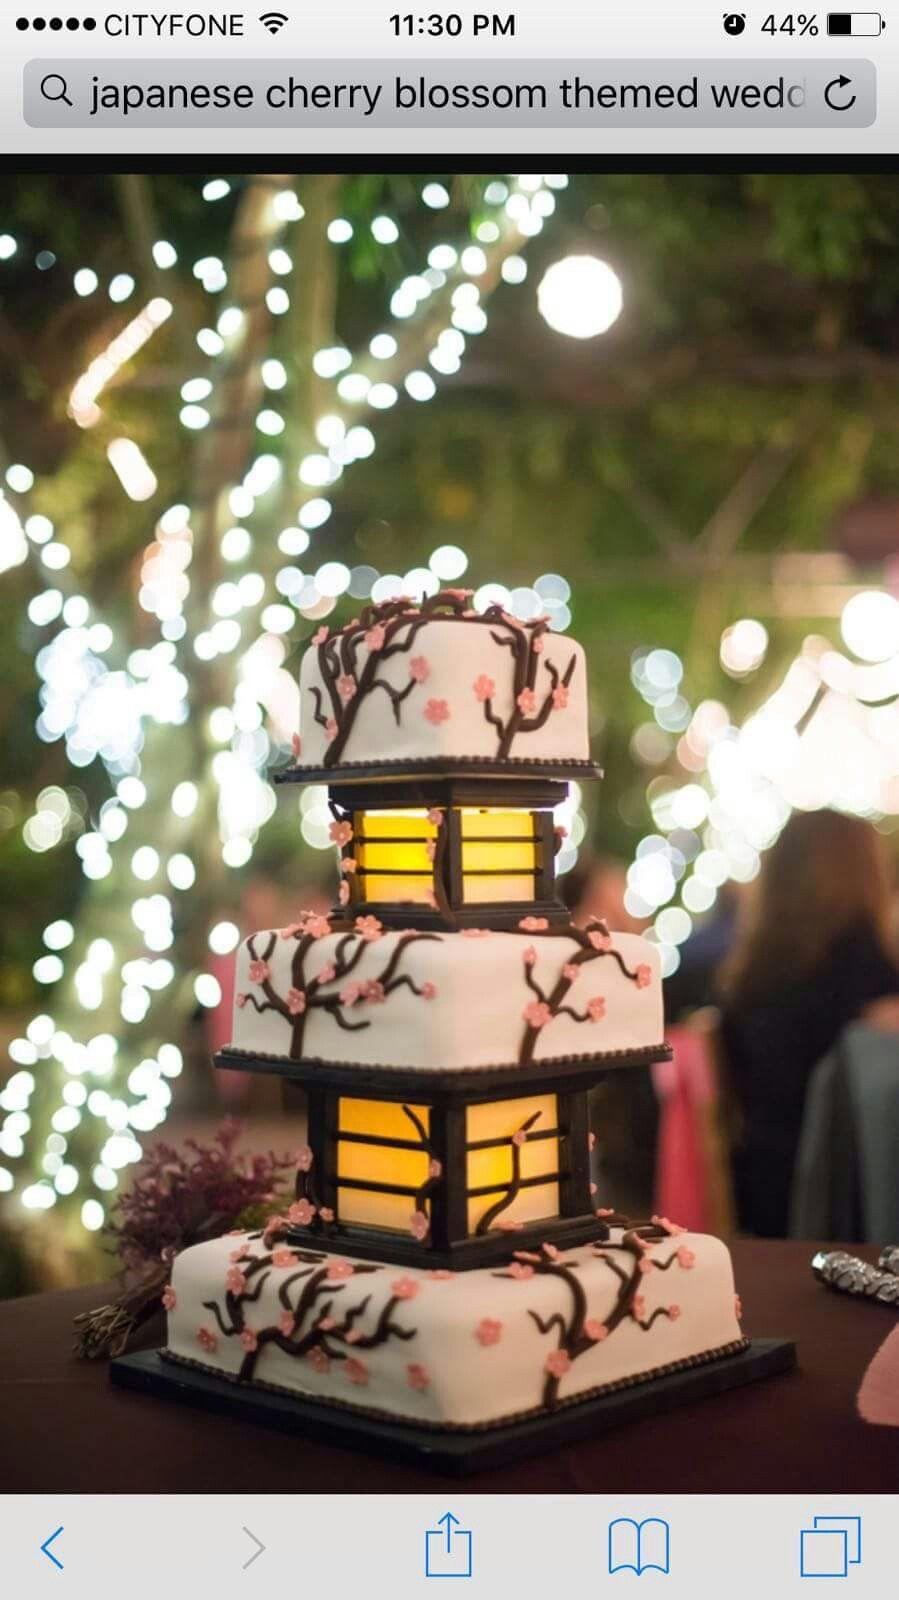 Pin by Lauri Crafts on cake stuff | Tree stump cake